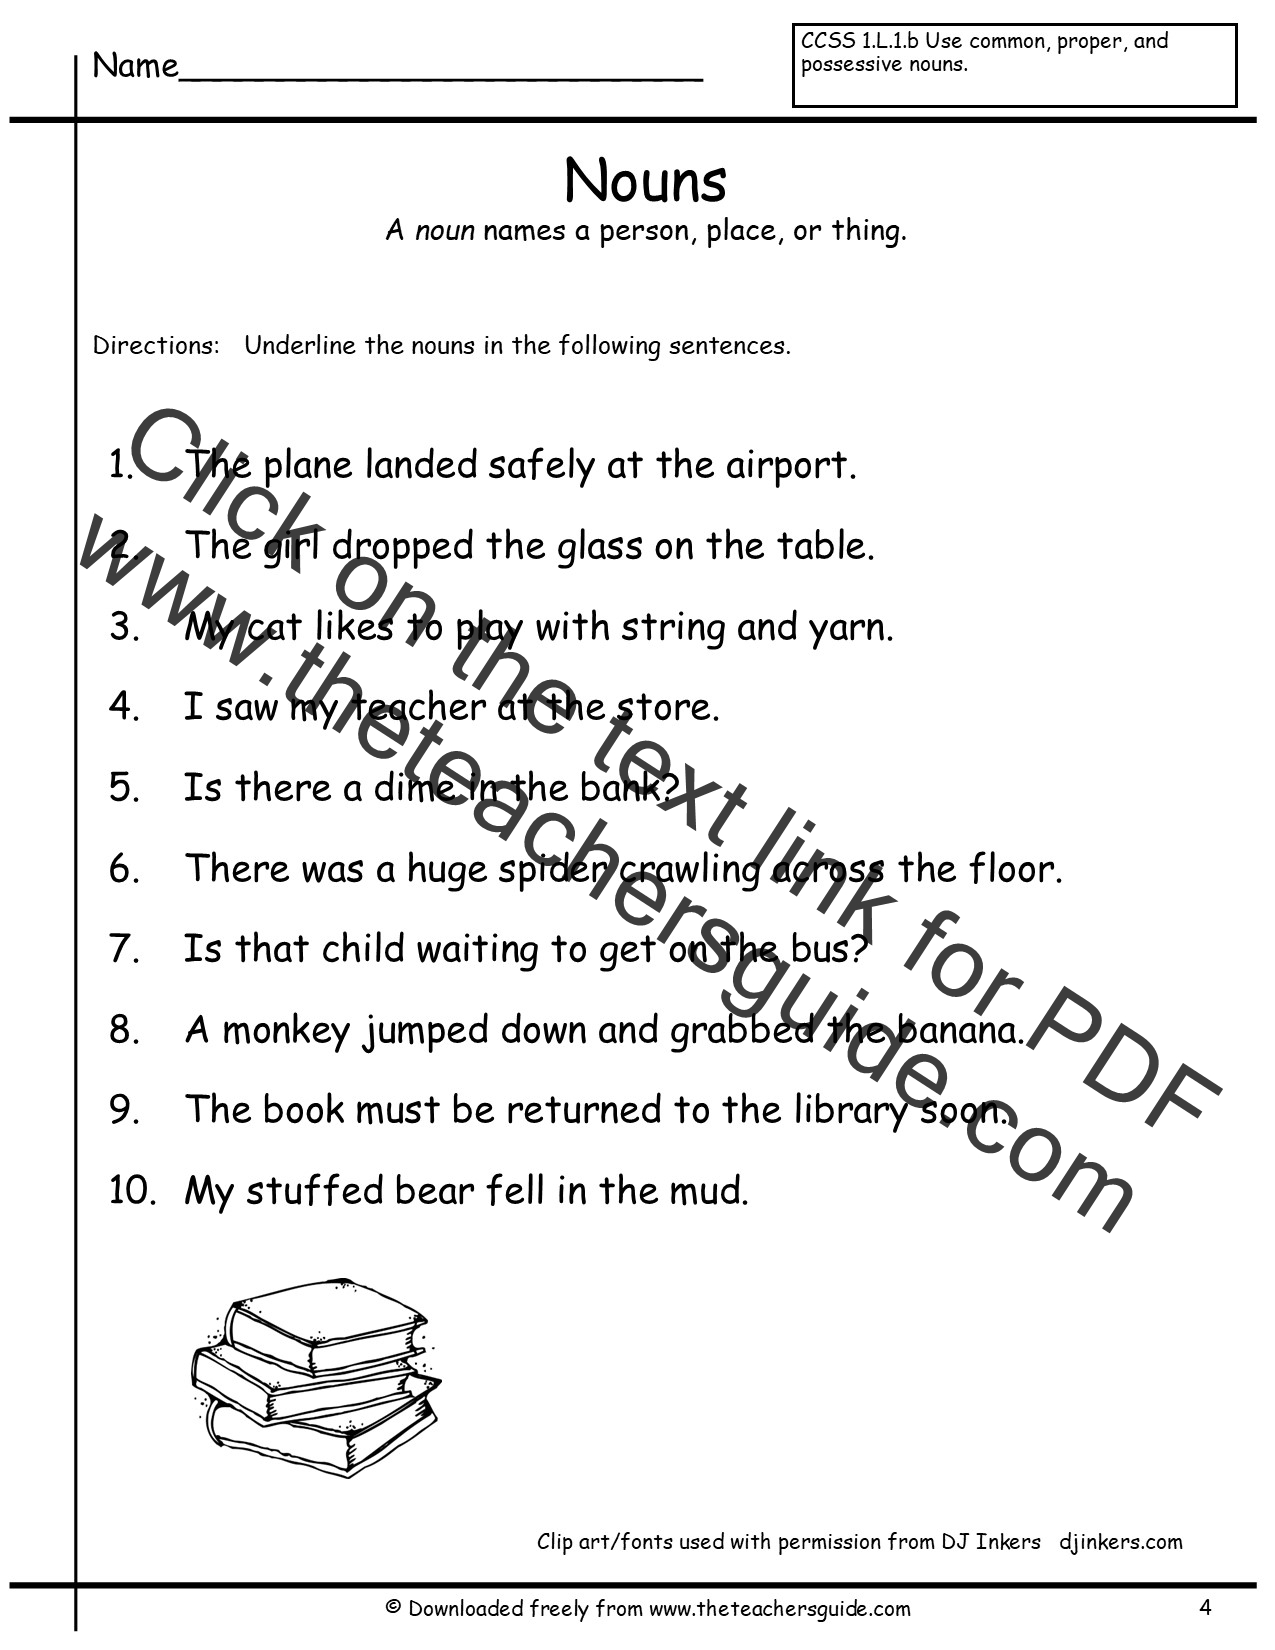 Possessive Nouns Quiz Printable